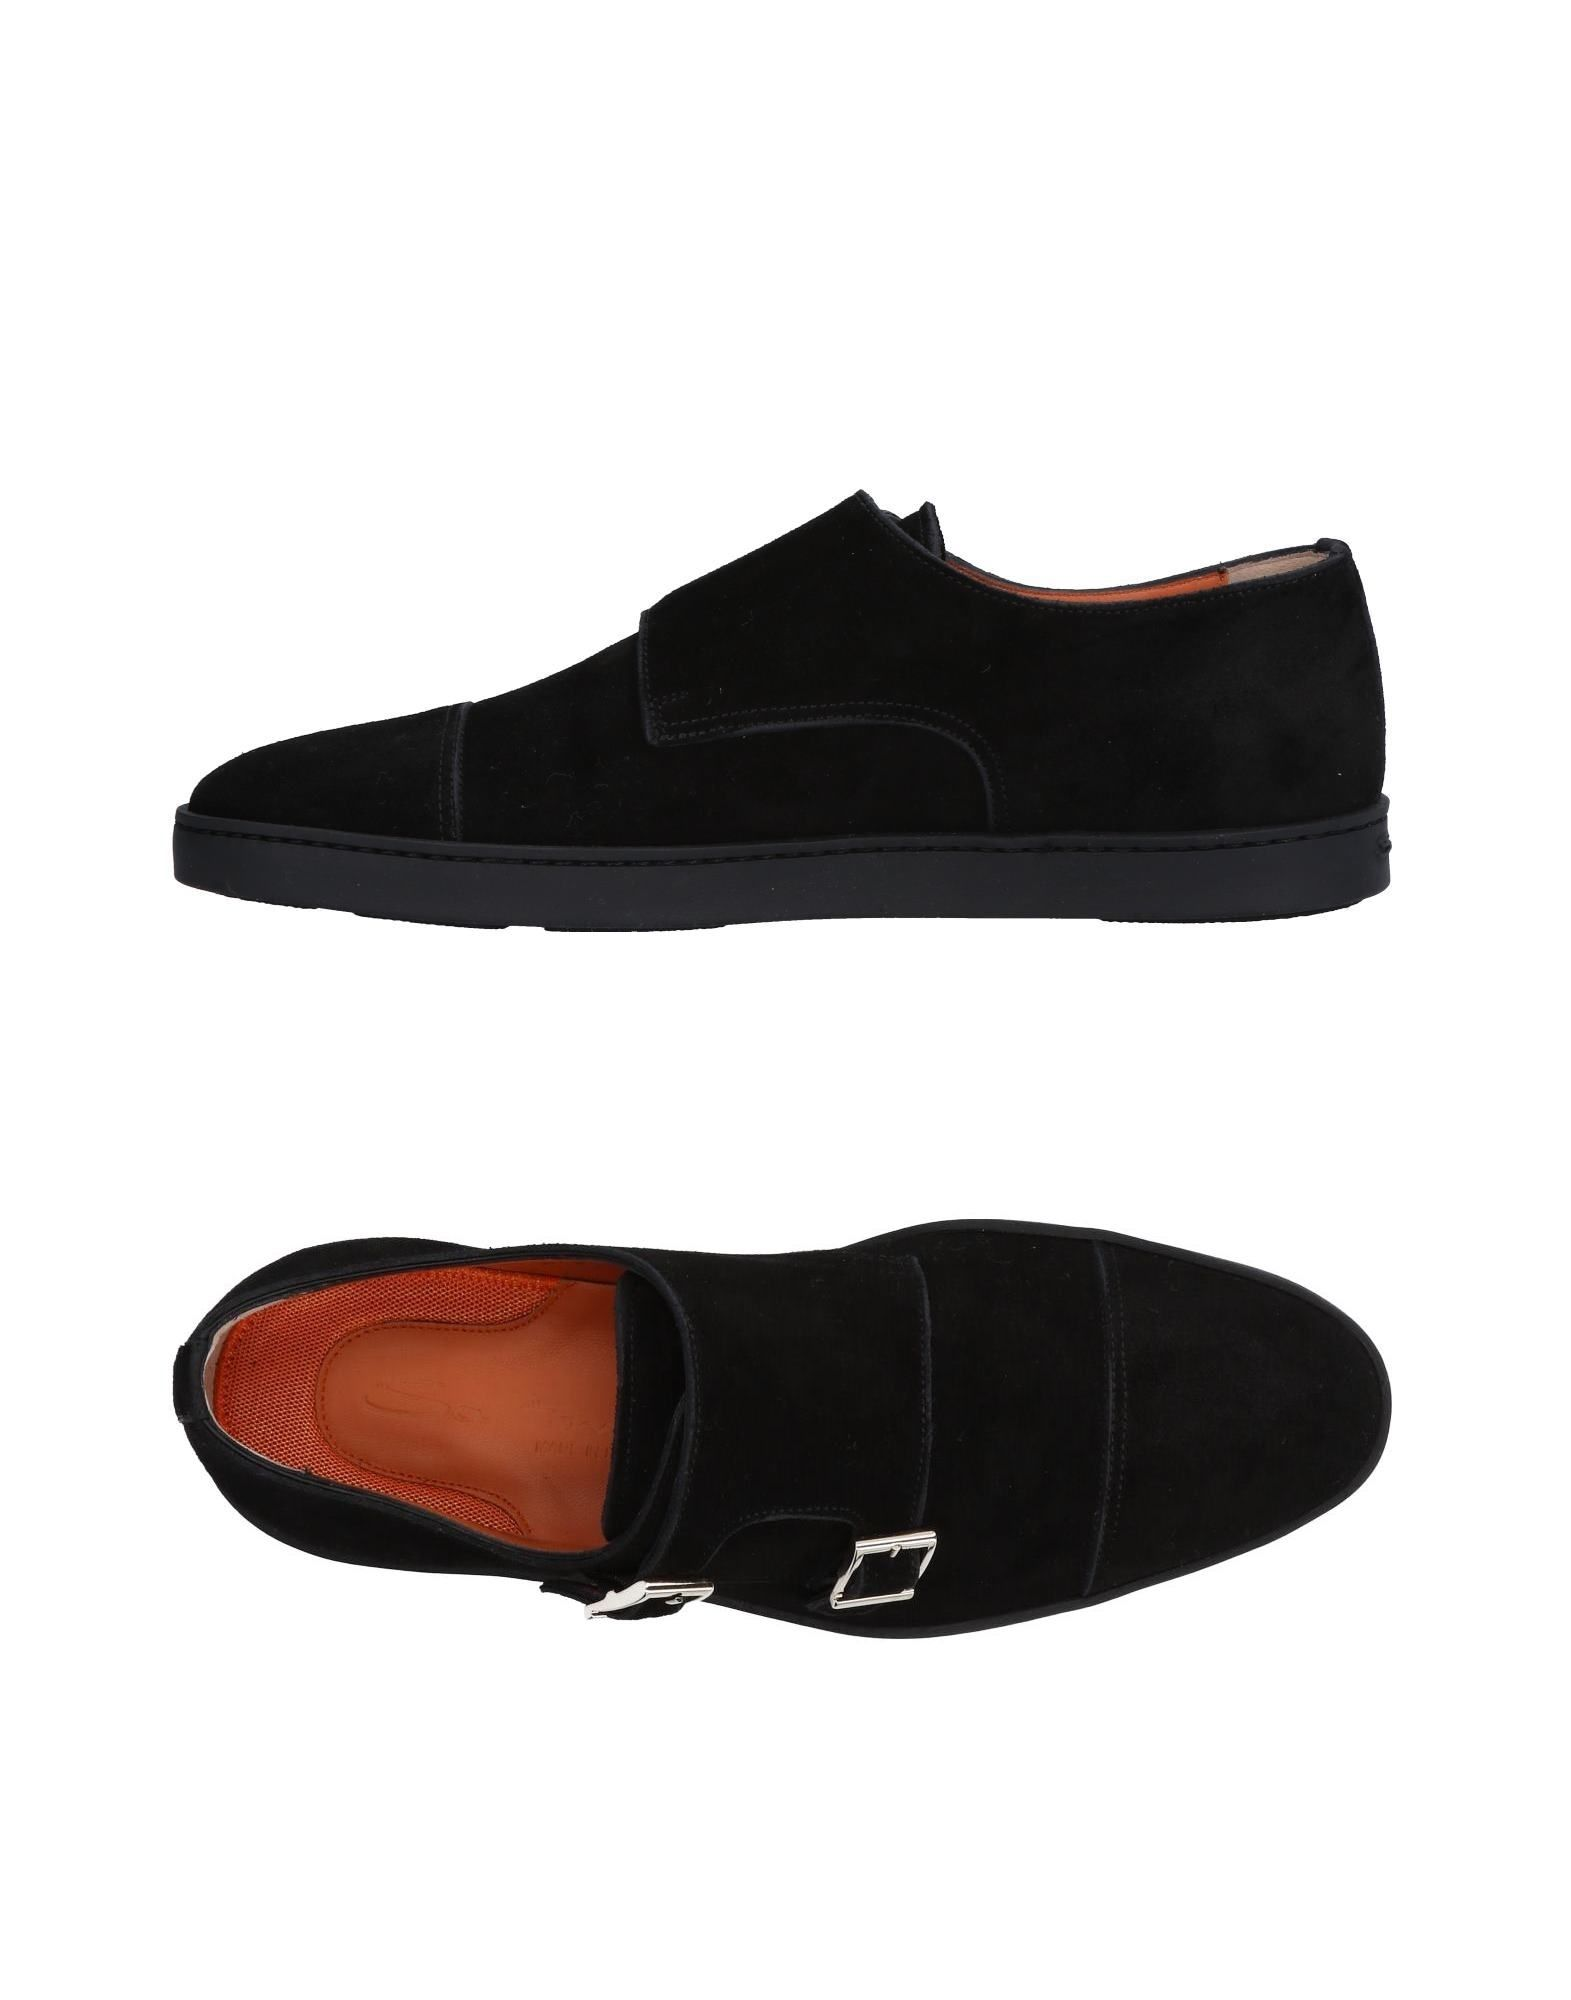 Santoni Mokassins Herren  11283738SS Gute Qualität beliebte Schuhe